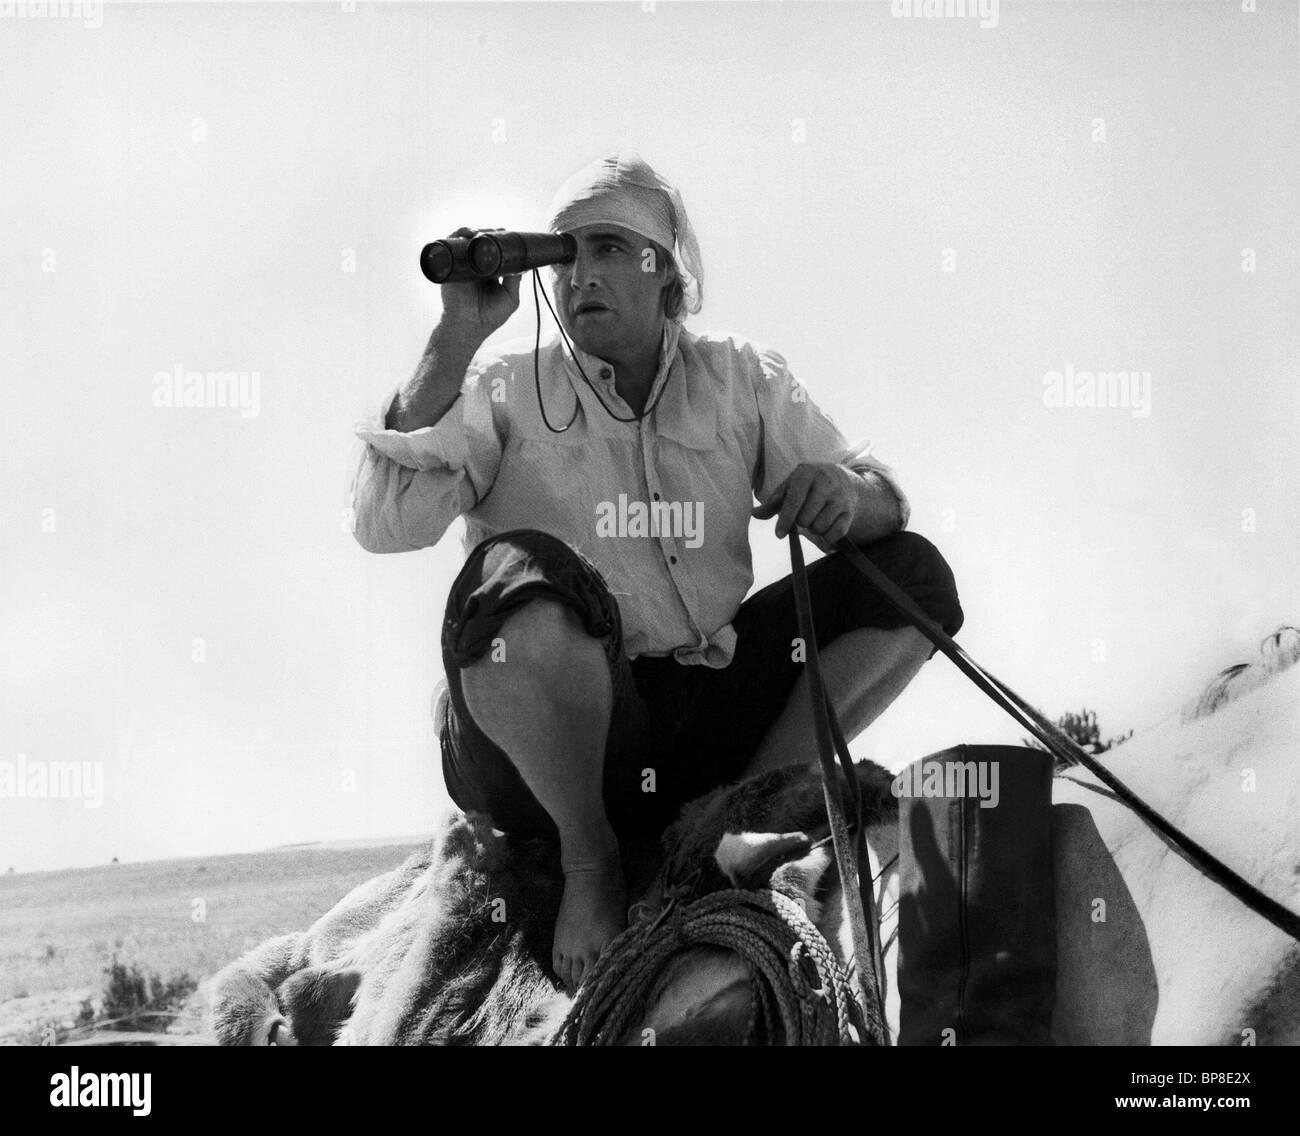 MARLON BRANDO THE MISSOURI BREAKS (1976) - Stock Image